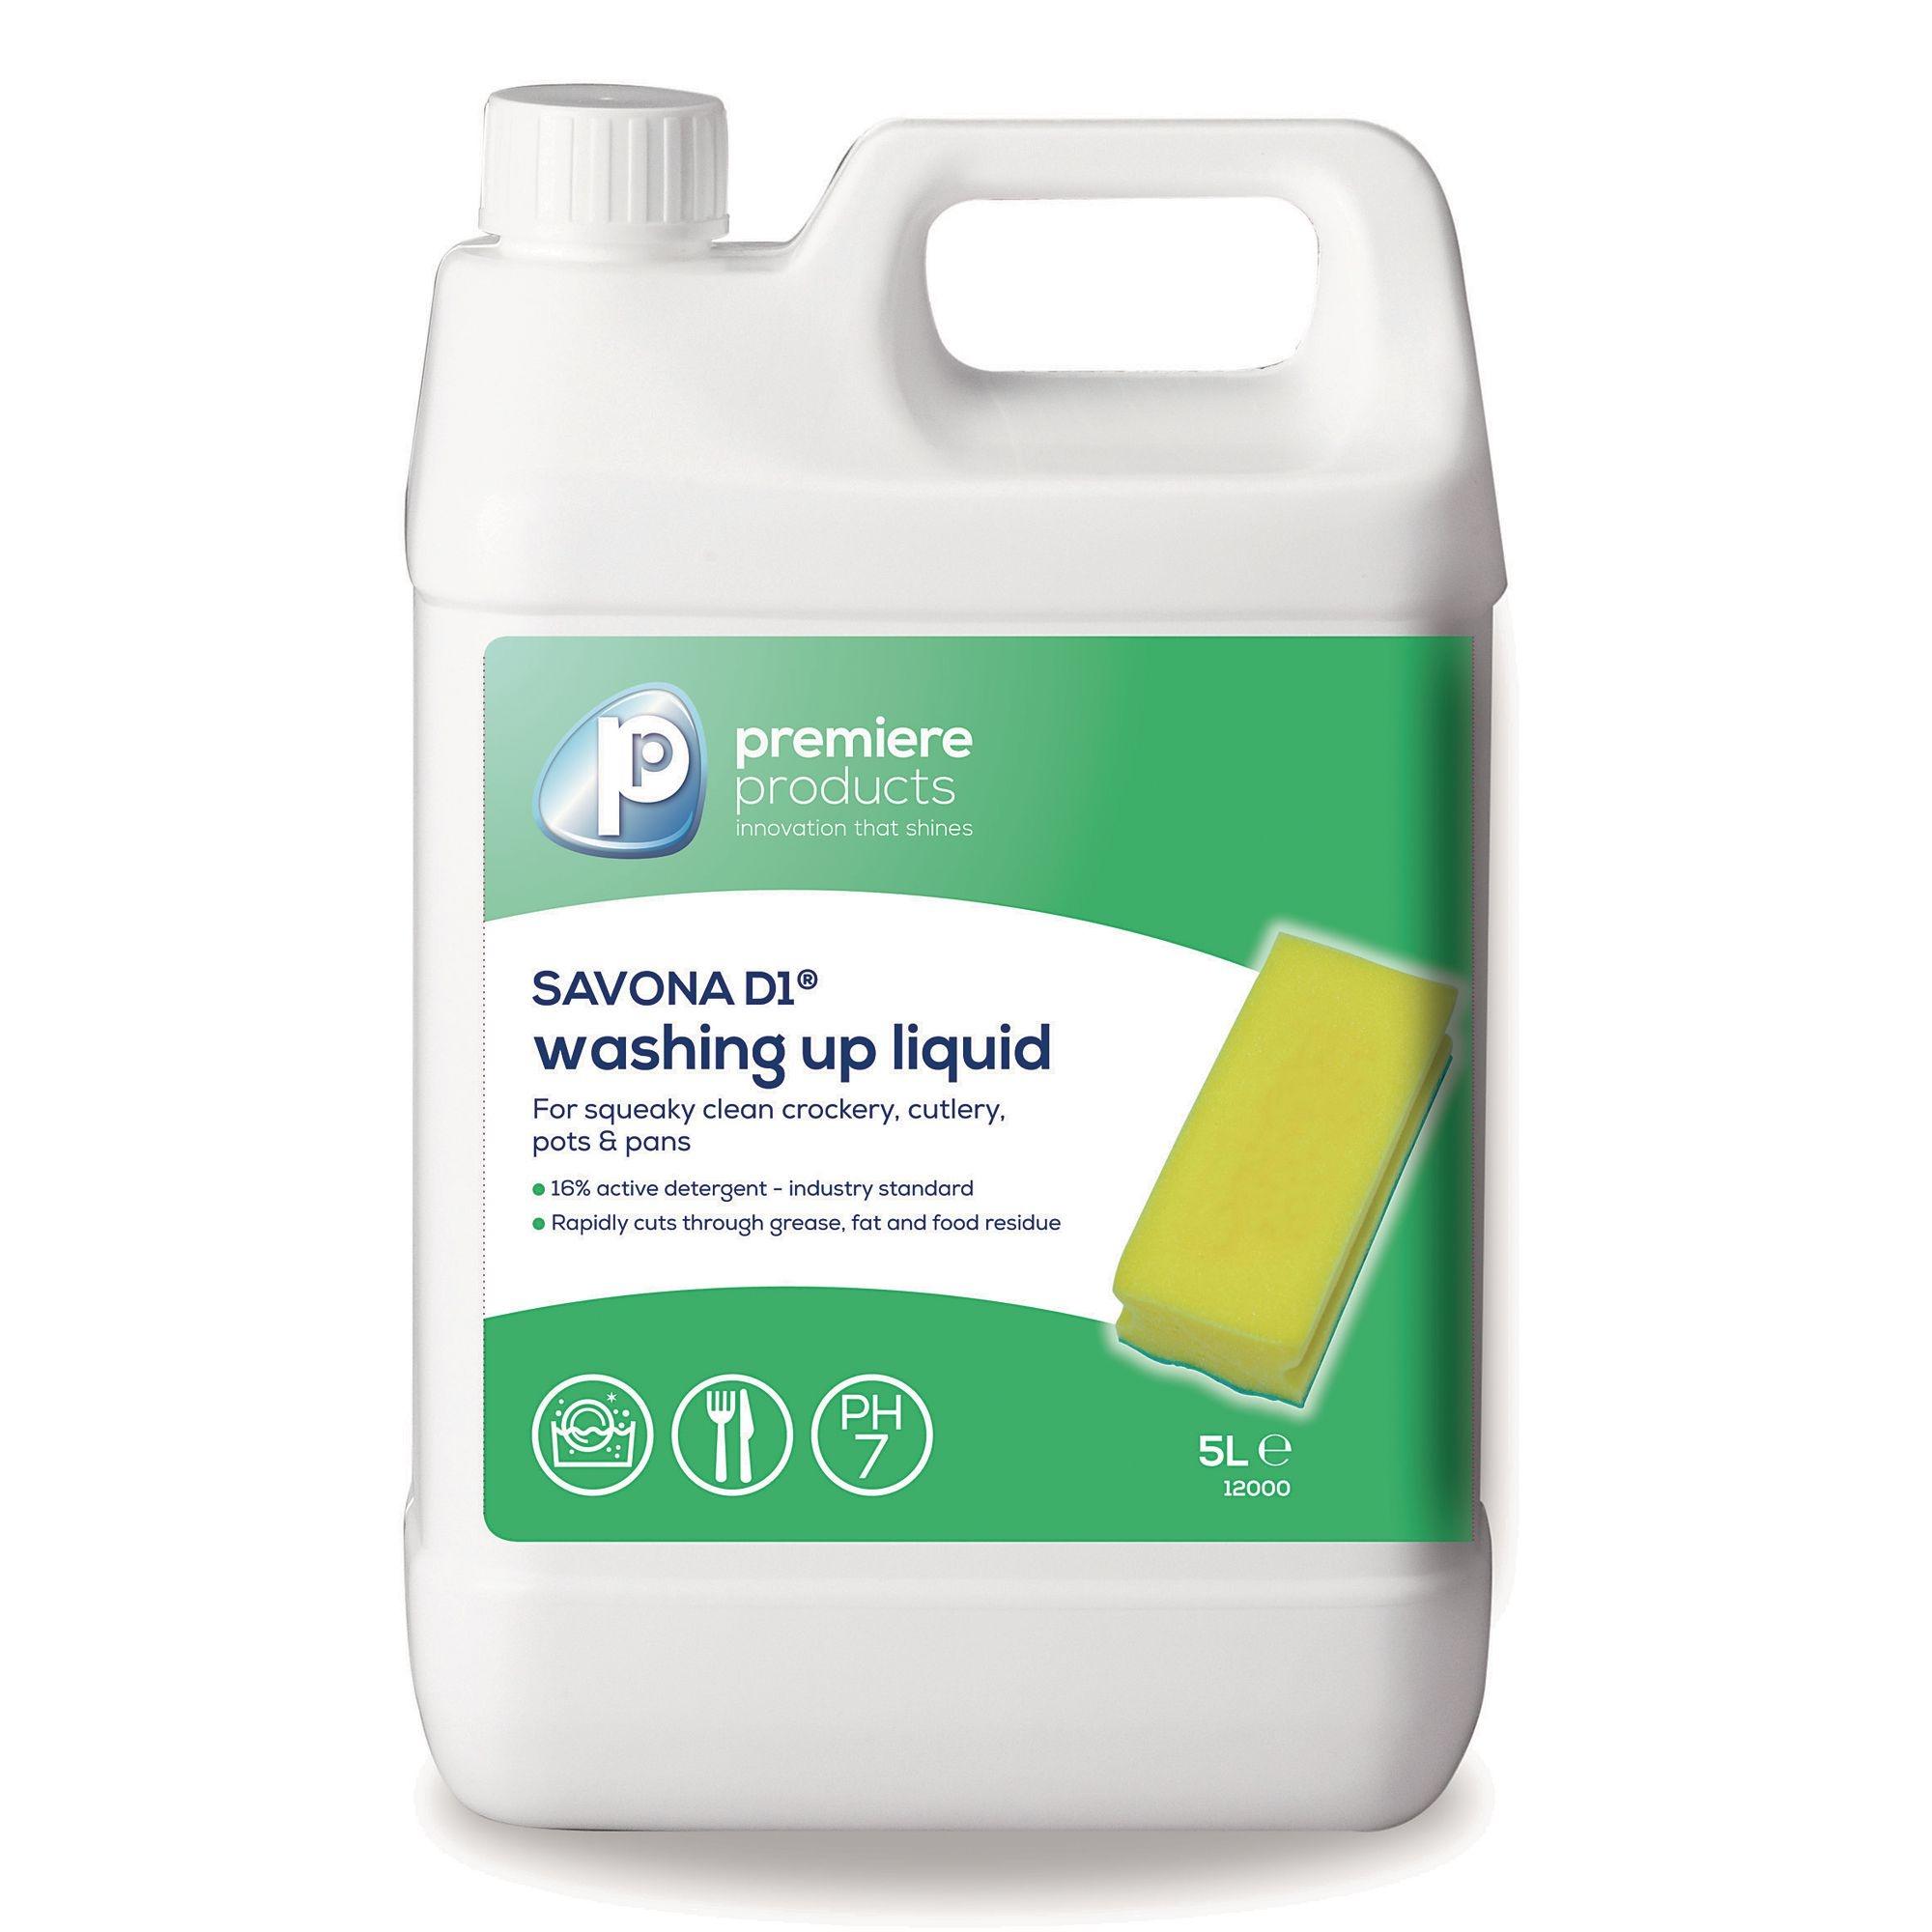 Savona D1 Washing Up Liquid 5L (Pack of 2)